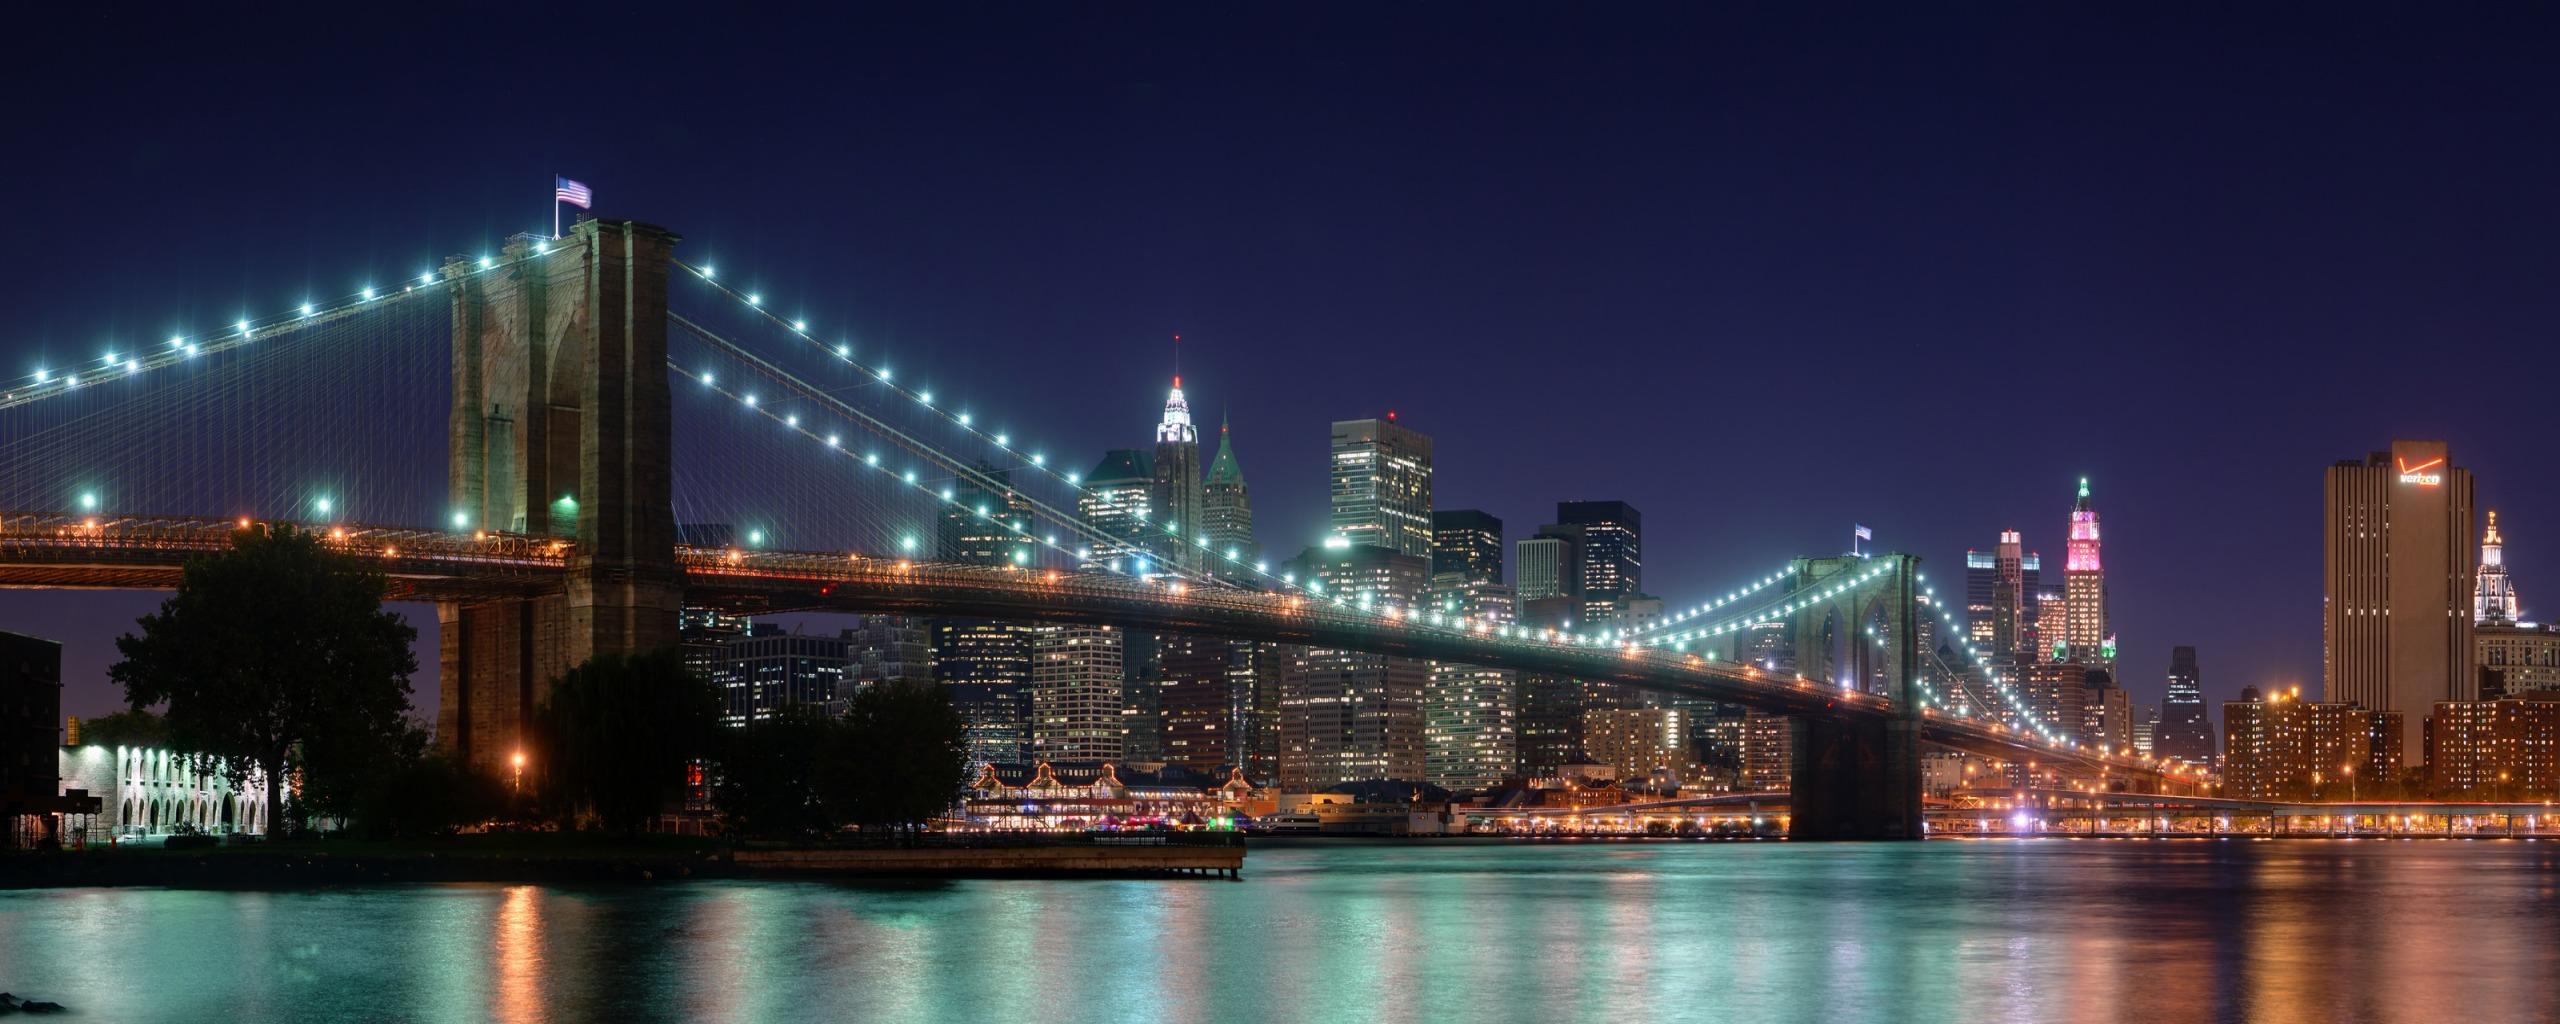 Brooklyn Bridge Panorama Dual Monitor Wallpapers HD Wallpapers 2560x1024